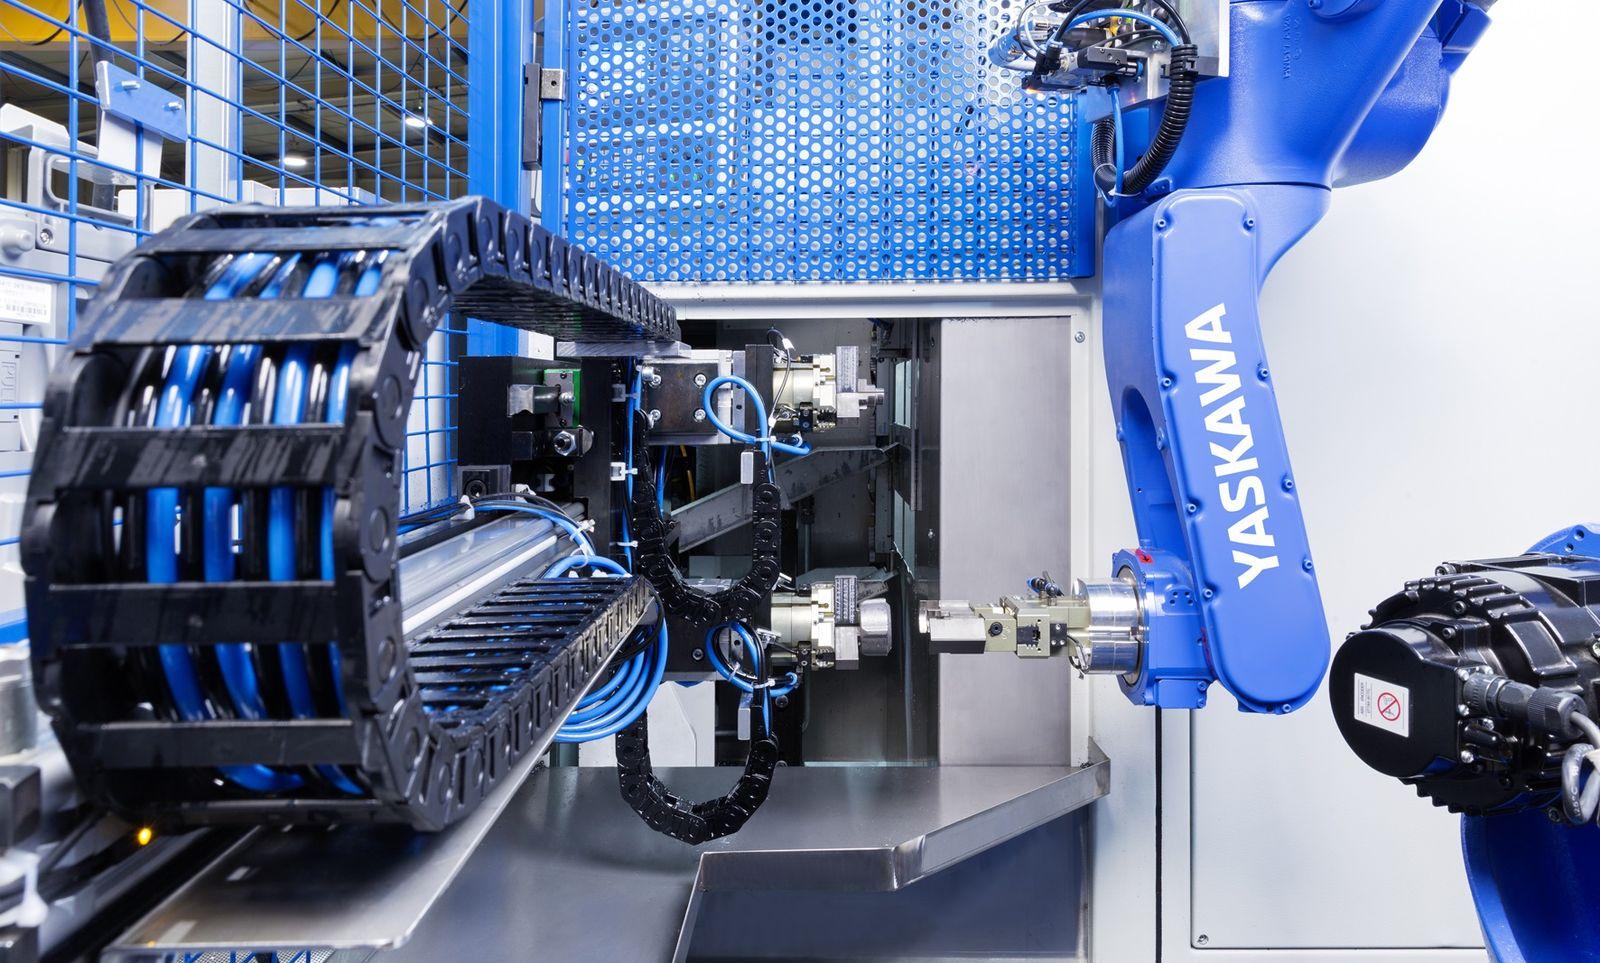 Four Yaskawa Motoman handling robots feed two turning